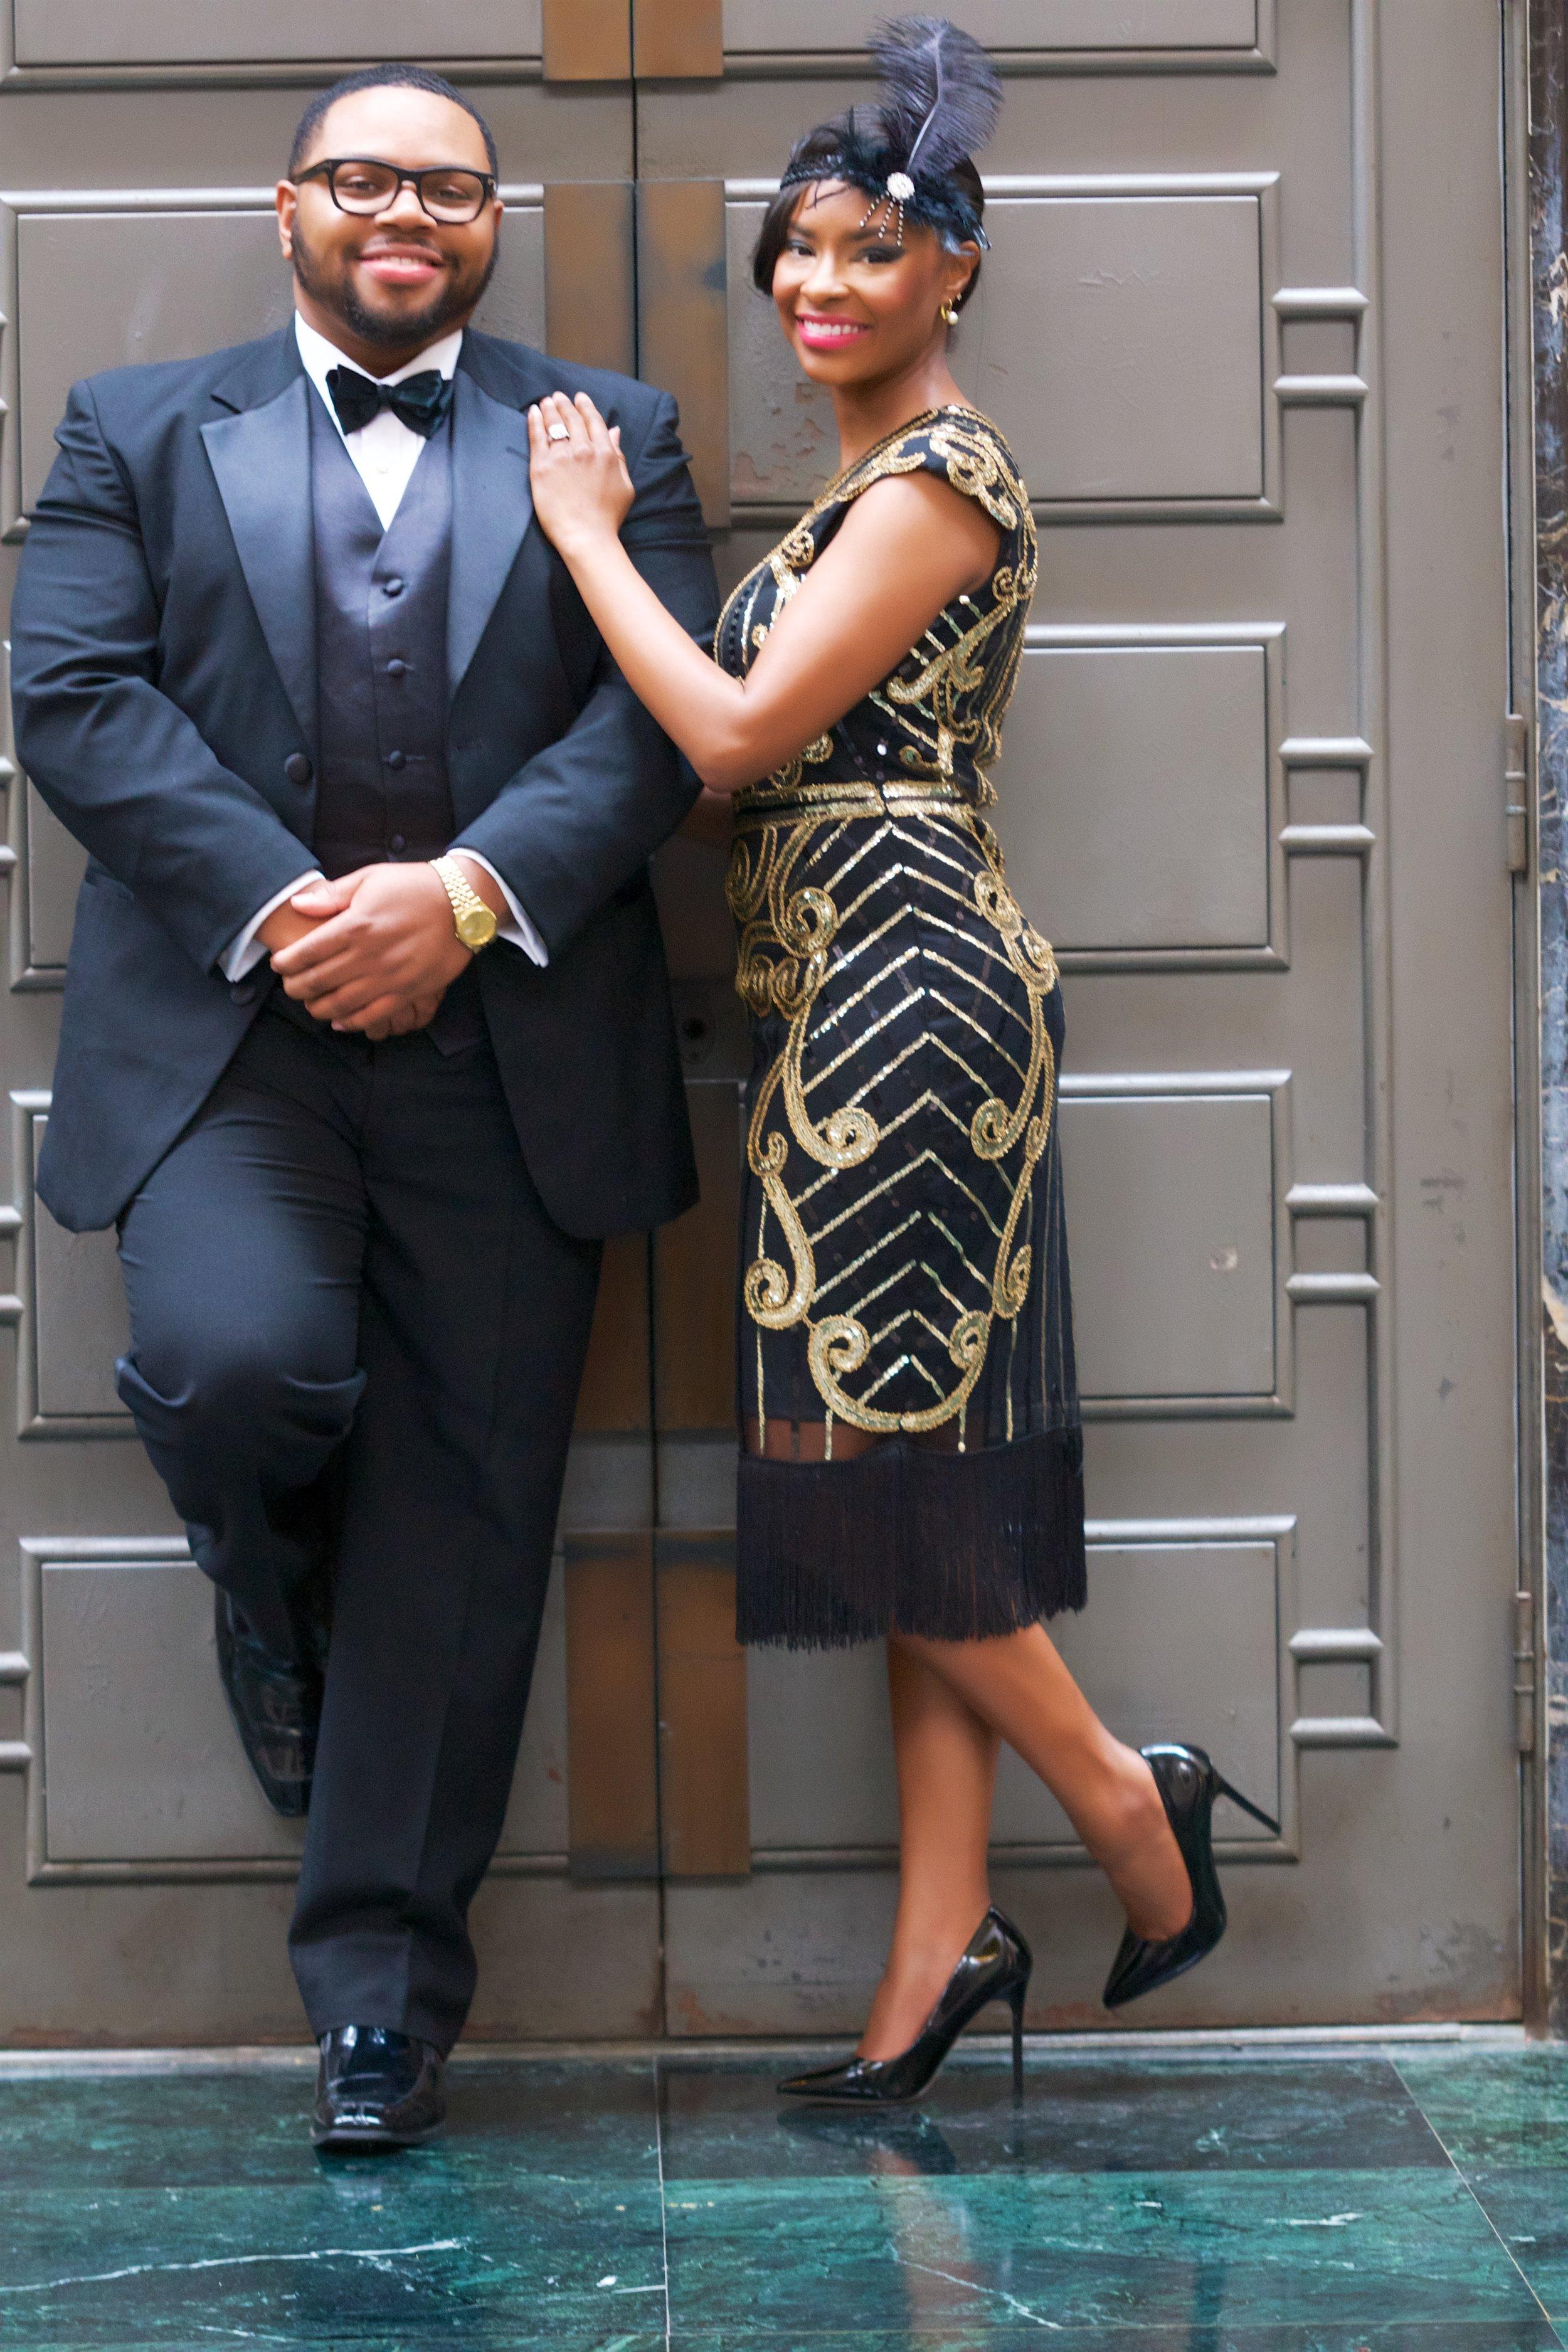 Xavier Jordan Photography - couple - save the date  XJ (80).jpg